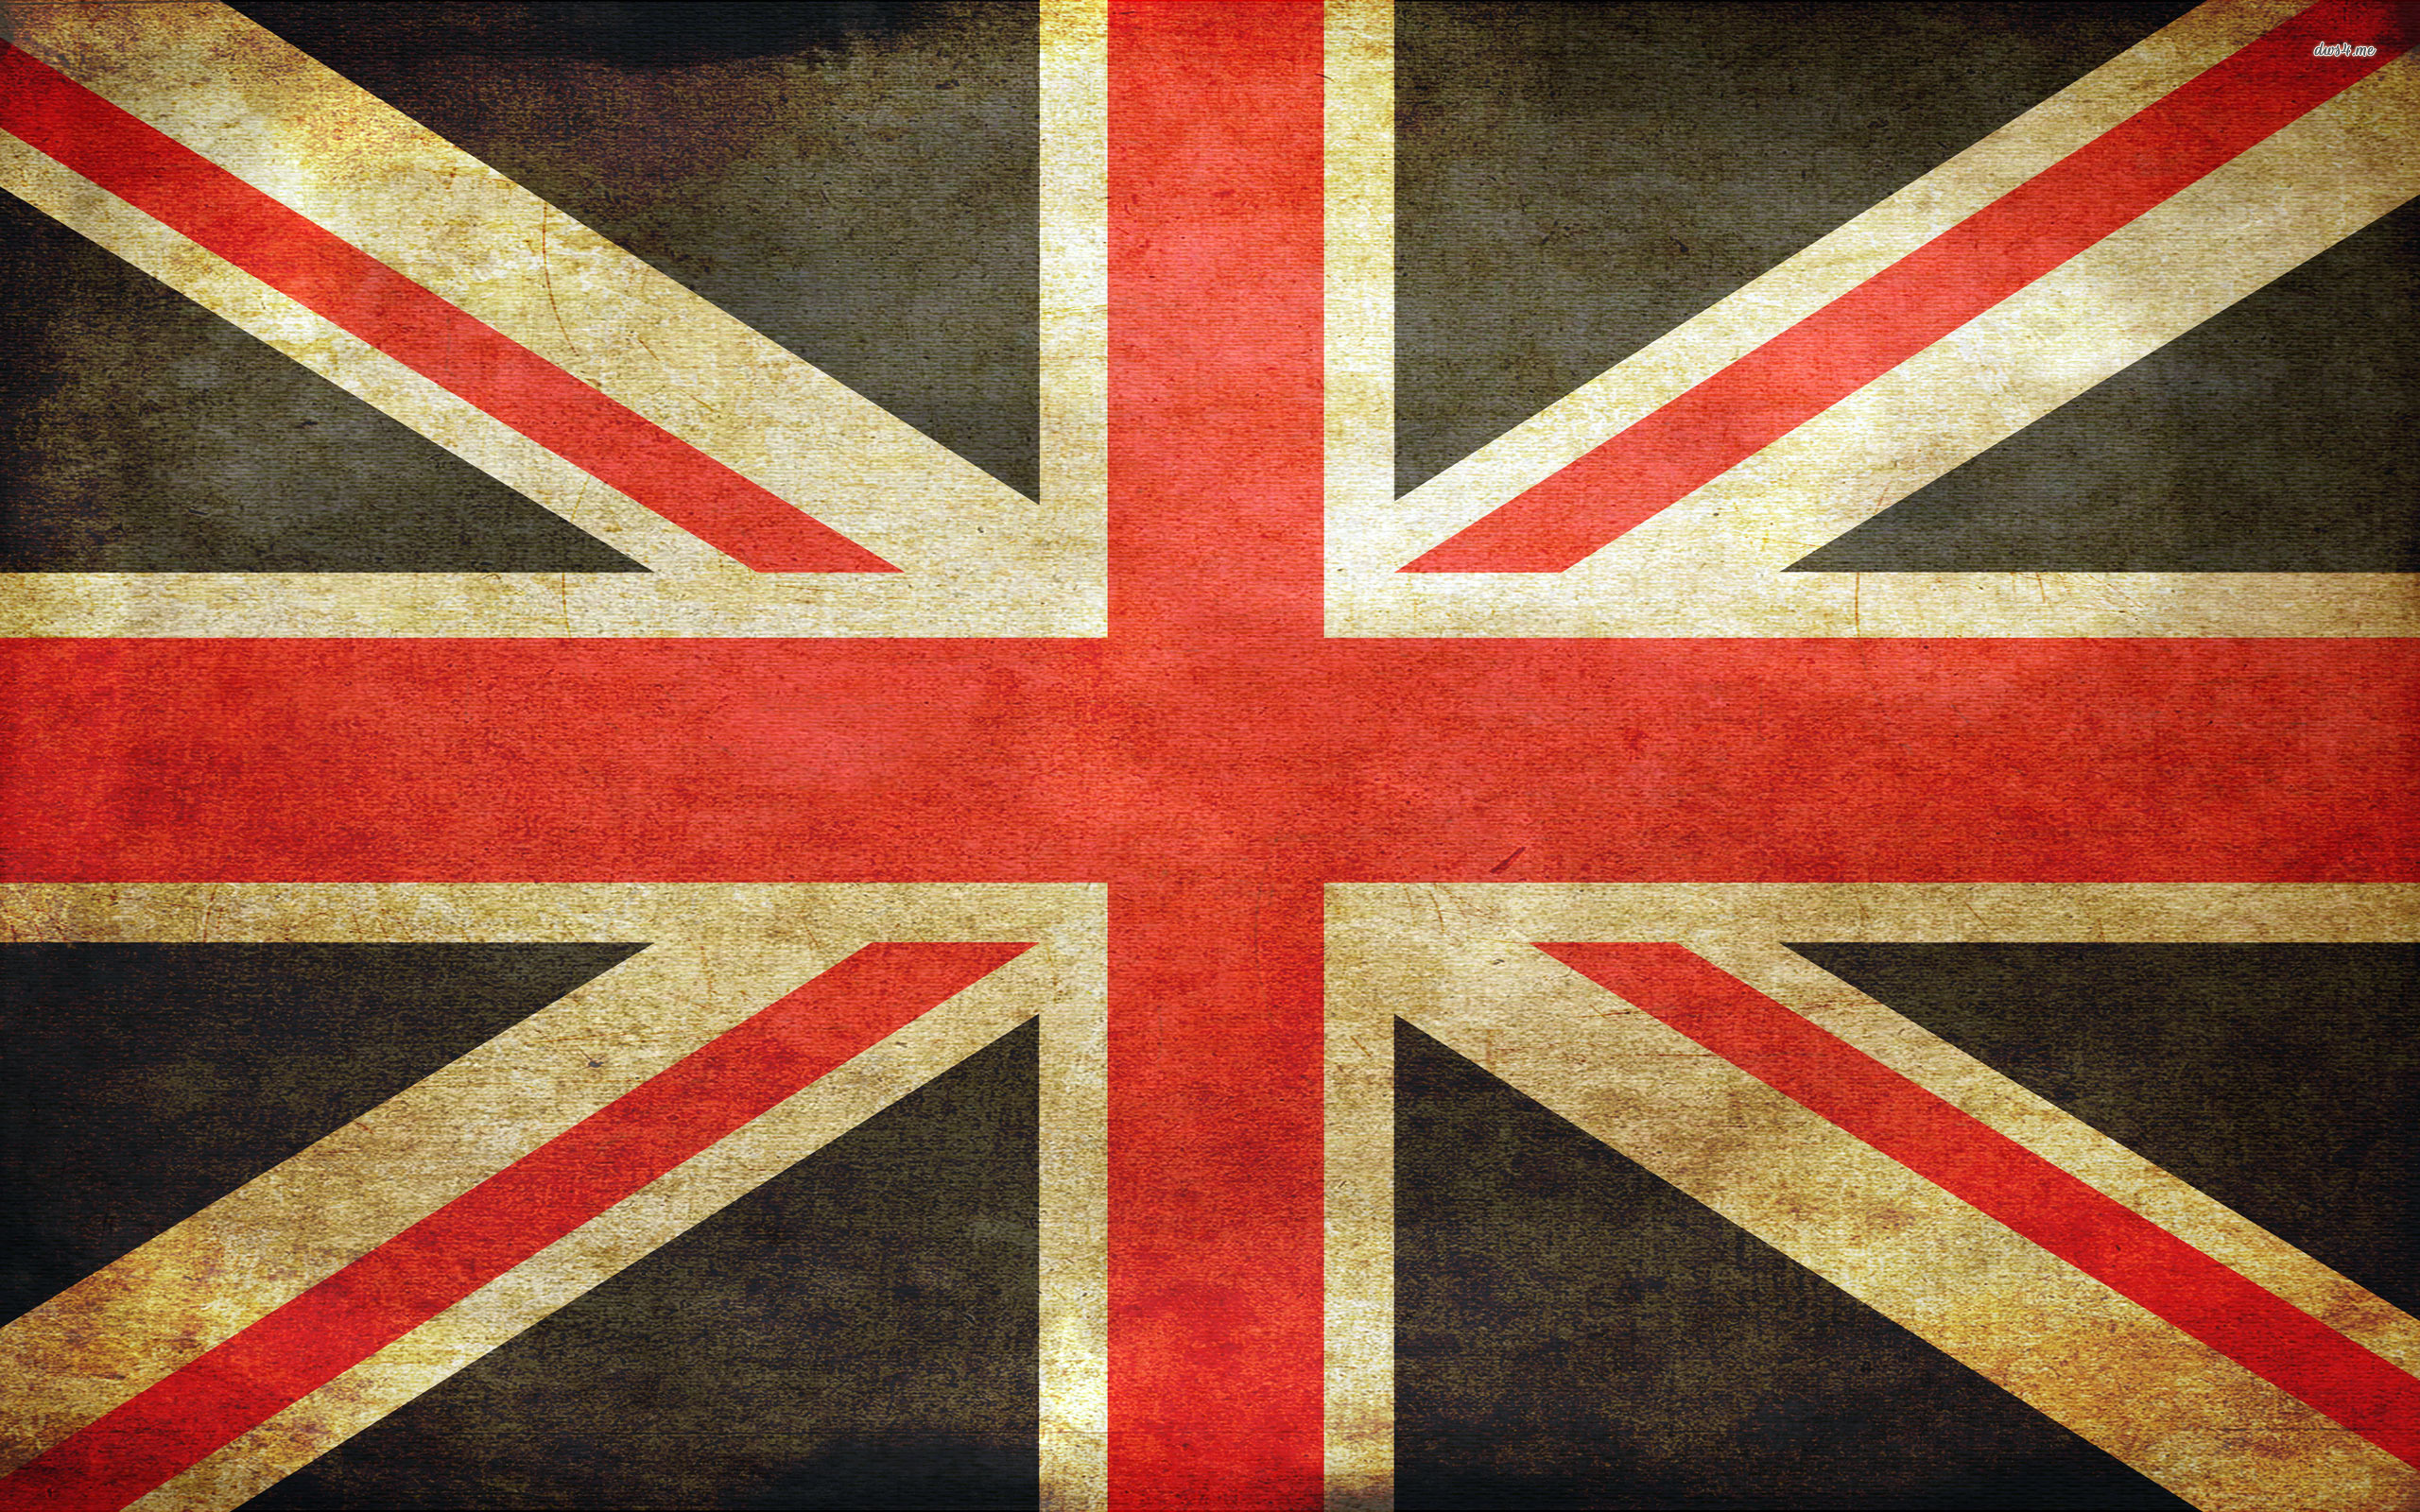 Wallpaper Manchester United Hd United Kingdom Flag Digital Art Digital Art